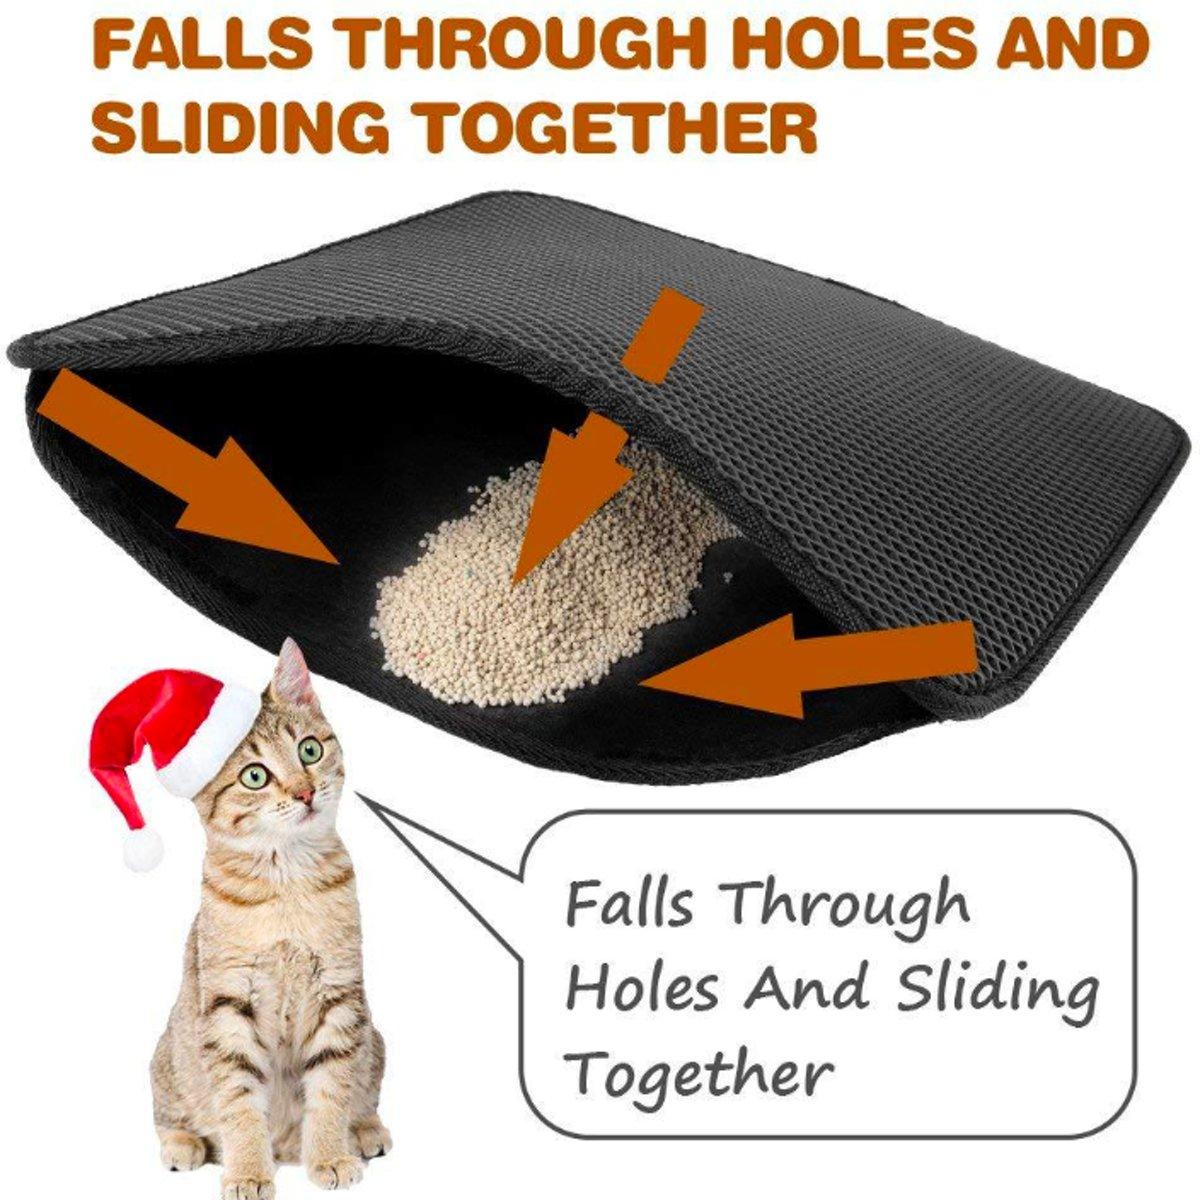 Kattenbakmat-Katten-Baktmat-kattenvulling-kattengrit Maat 40x50 kopen